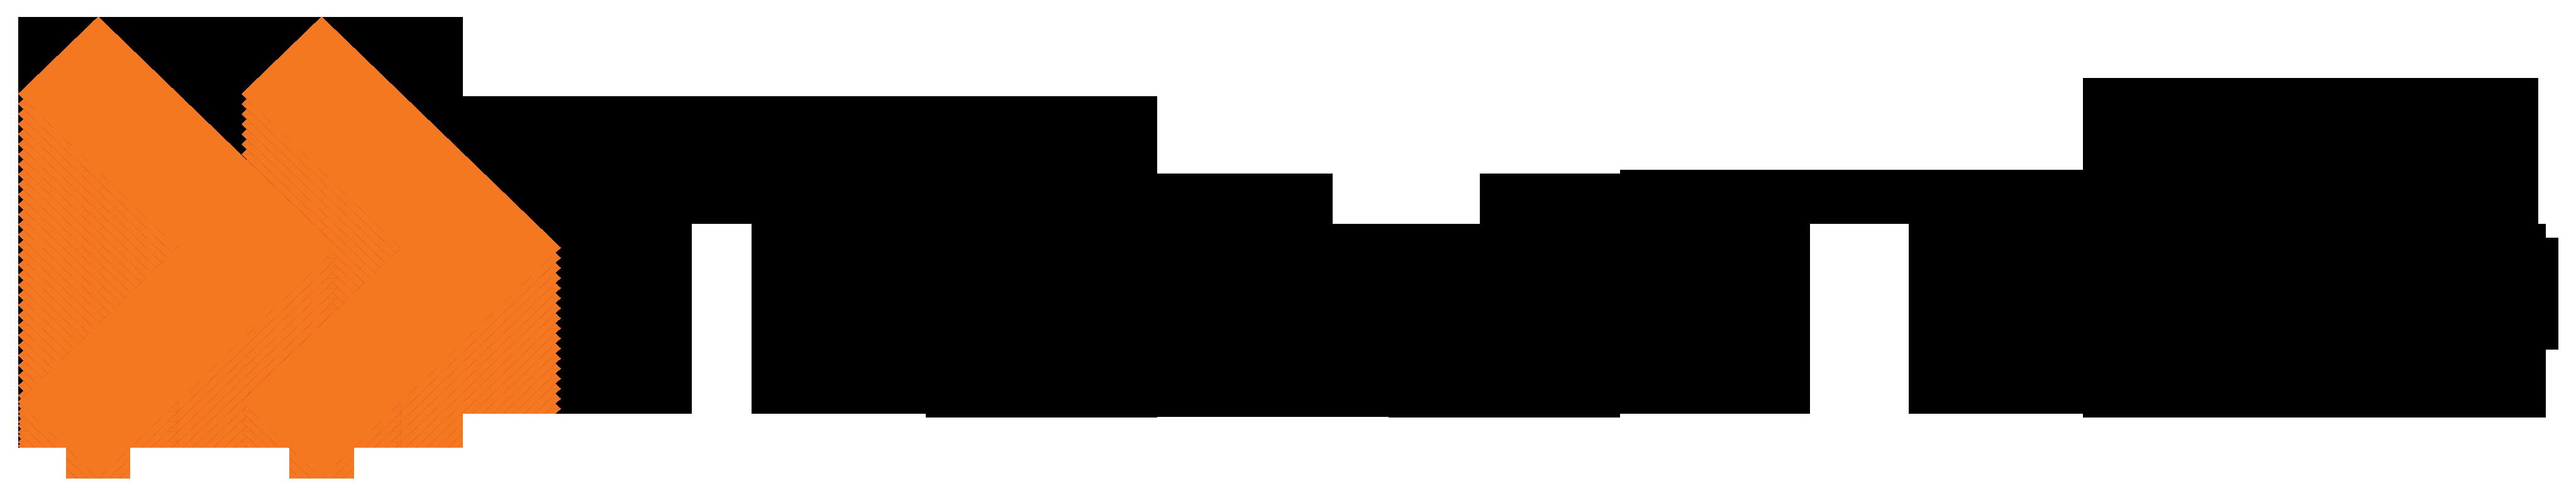 Neumob